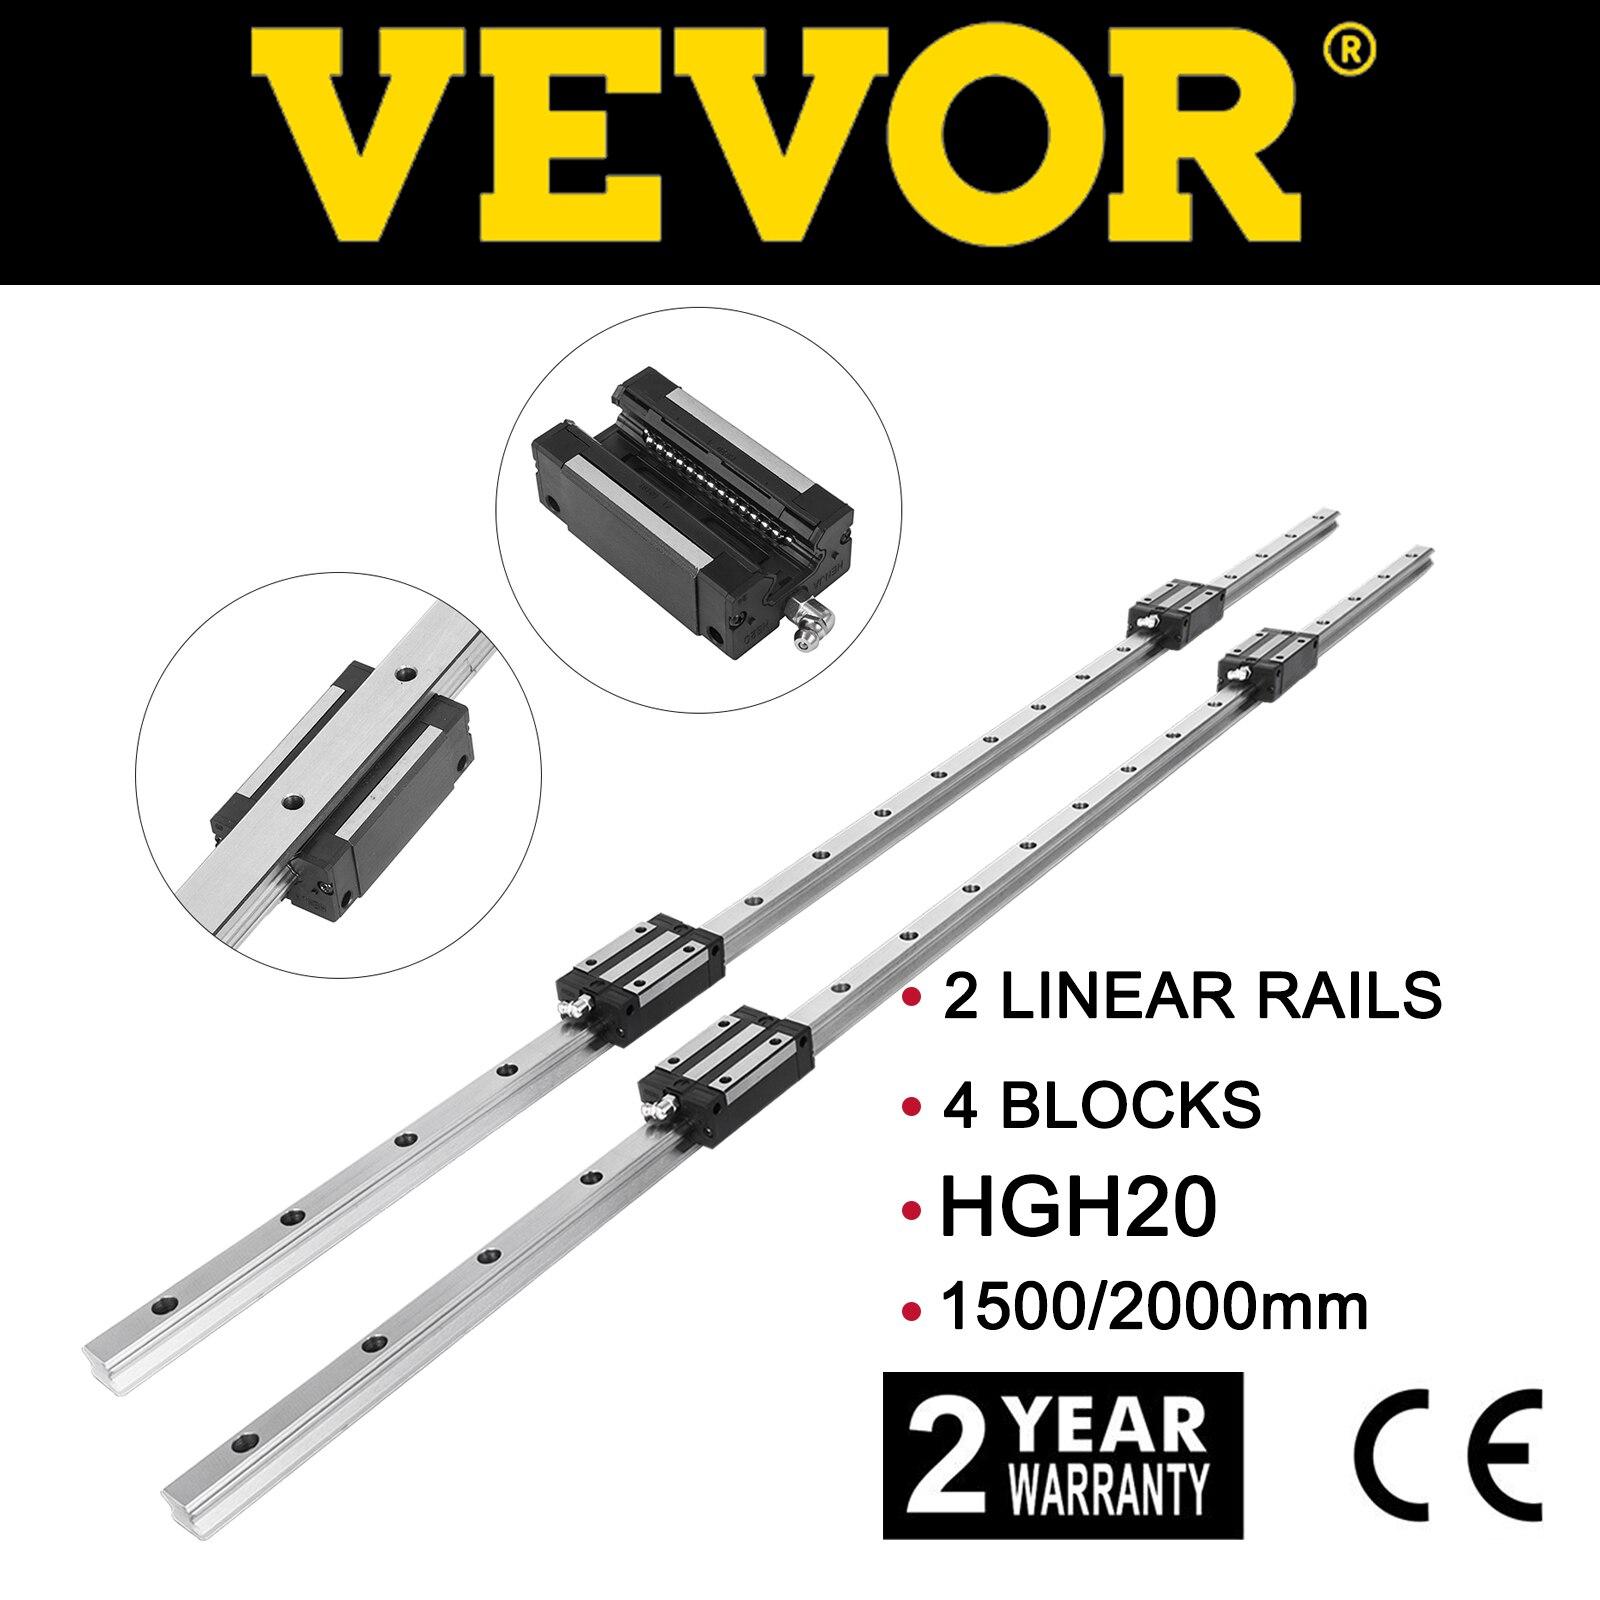 VEVOR 2 قطعة HGH20 دليل خطي السكك الحديدية رمح قضيب عدة طول 1200 مللي متر 1500 مللي متر 4x نك راوتر ميكانيكية تحمل كتلة السلس انزلاق